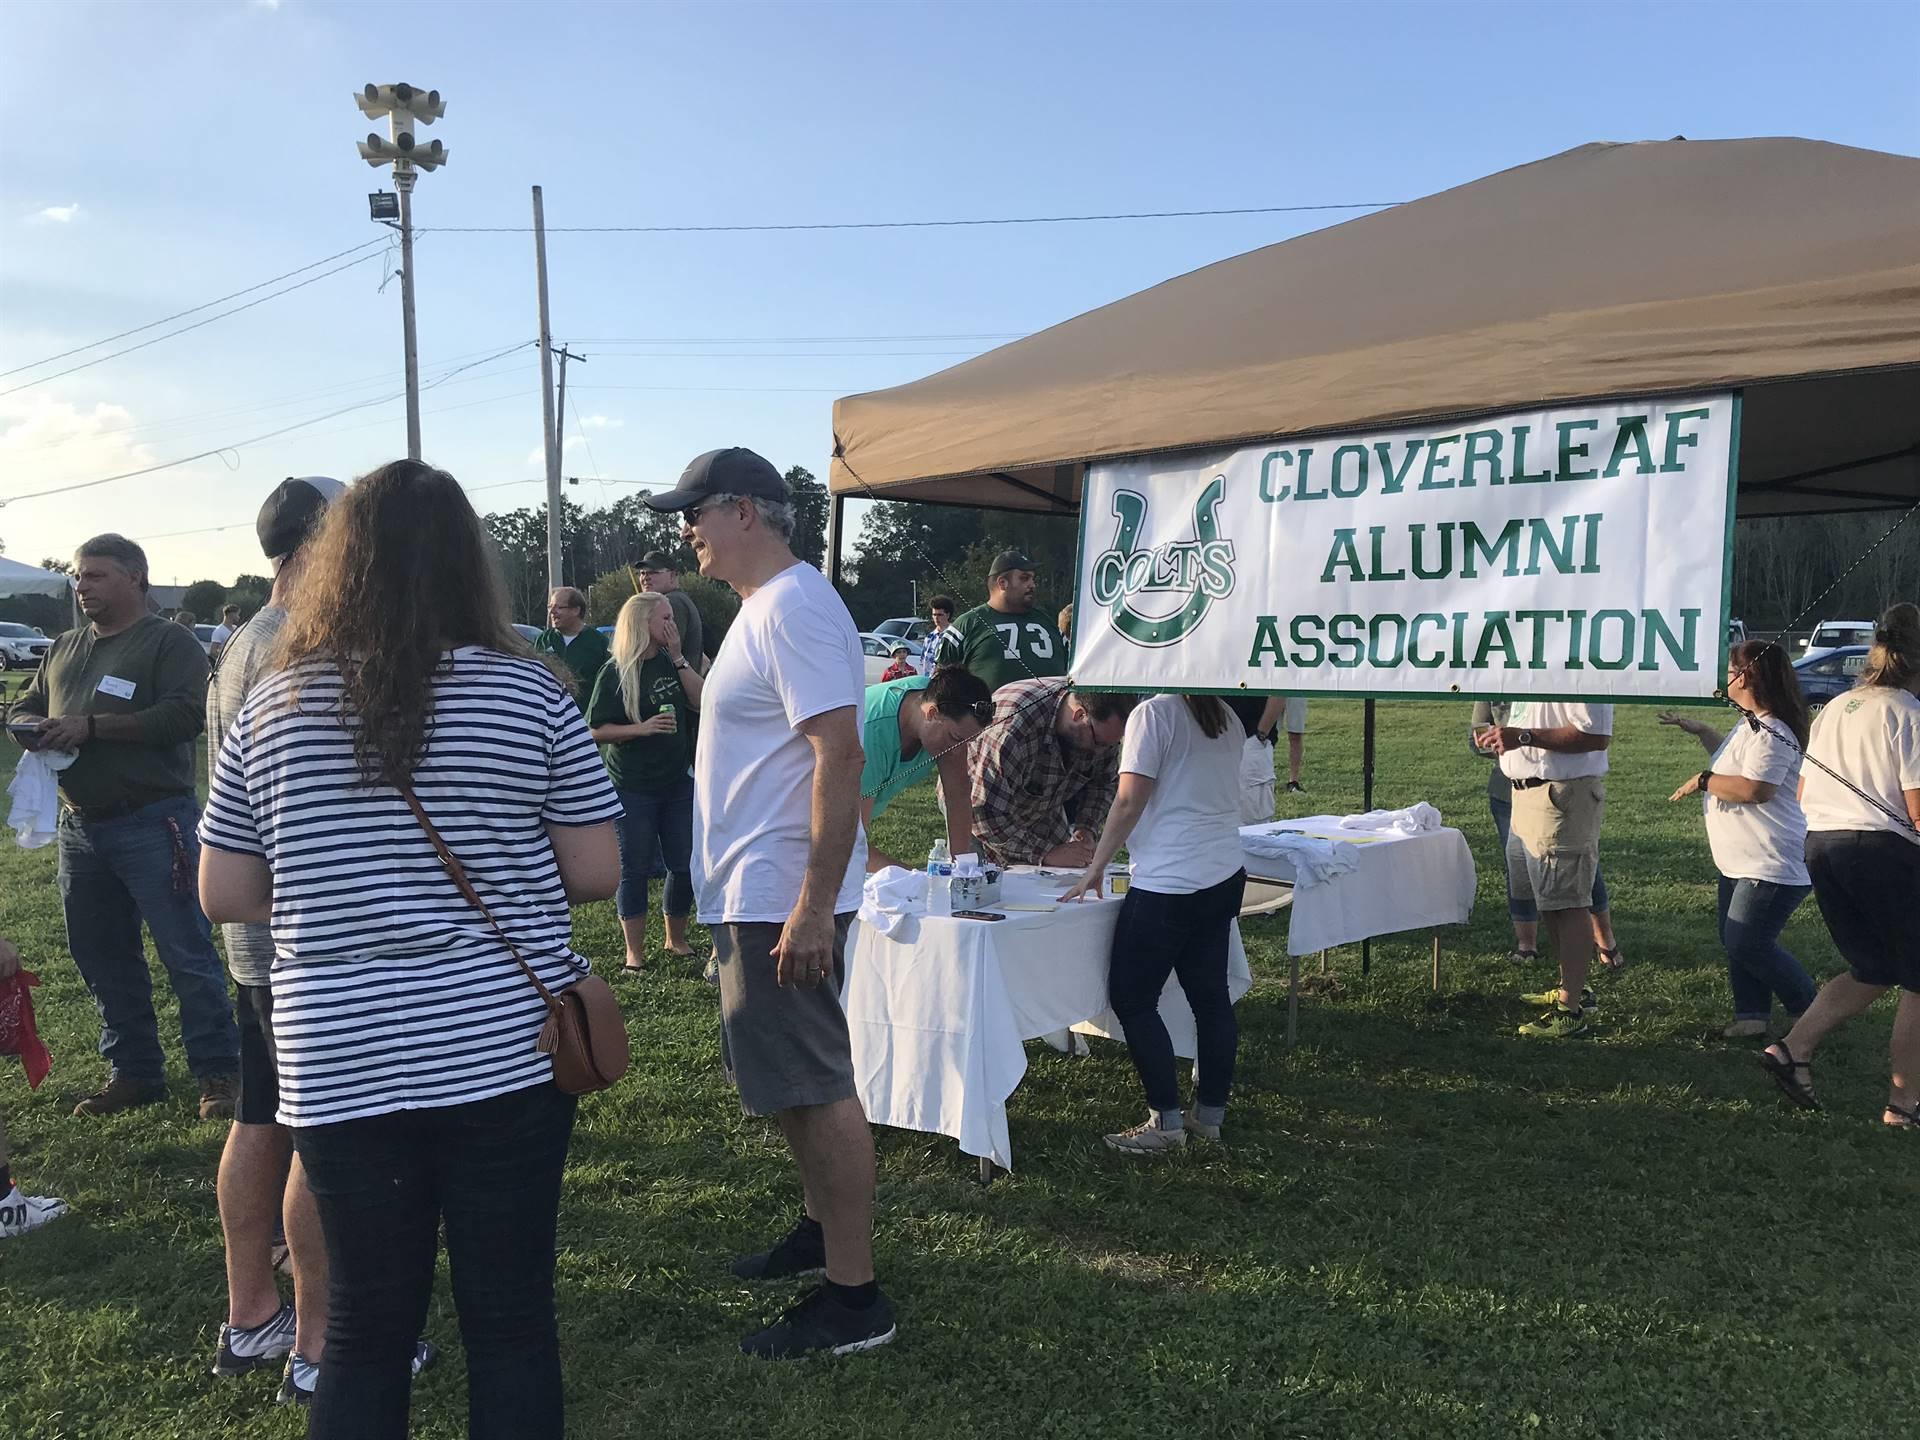 Cloverleaf Alumni Association banner